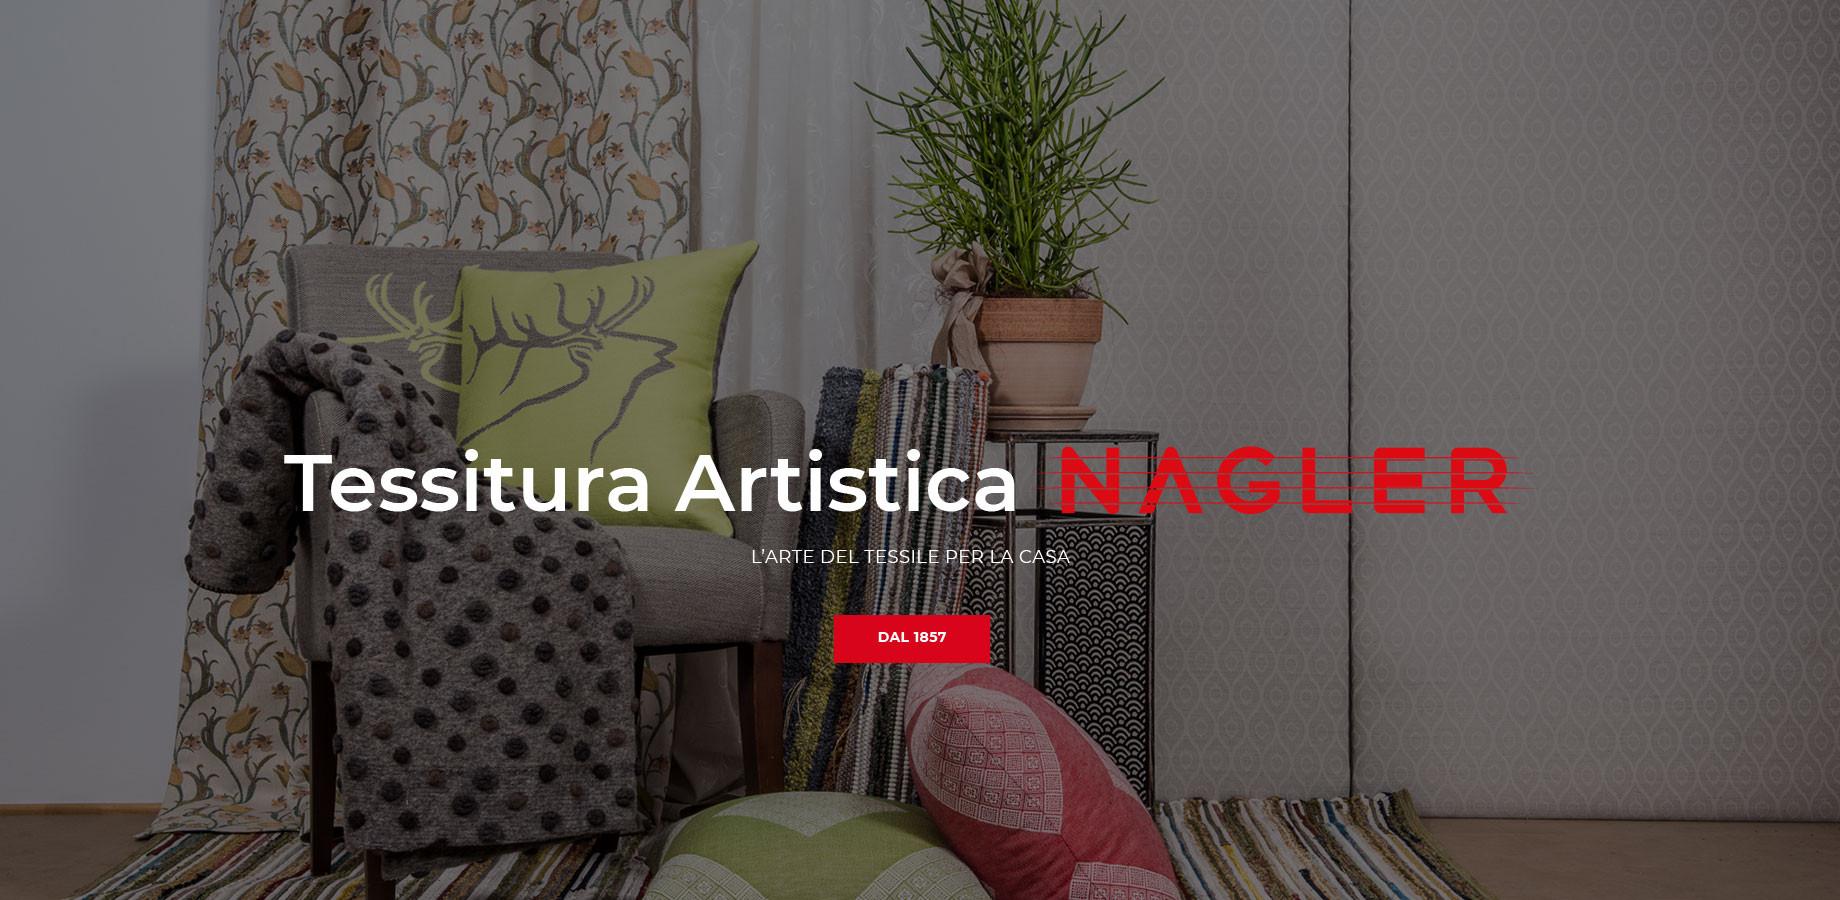 Tessitura Artistica Nagler in Alta Badia